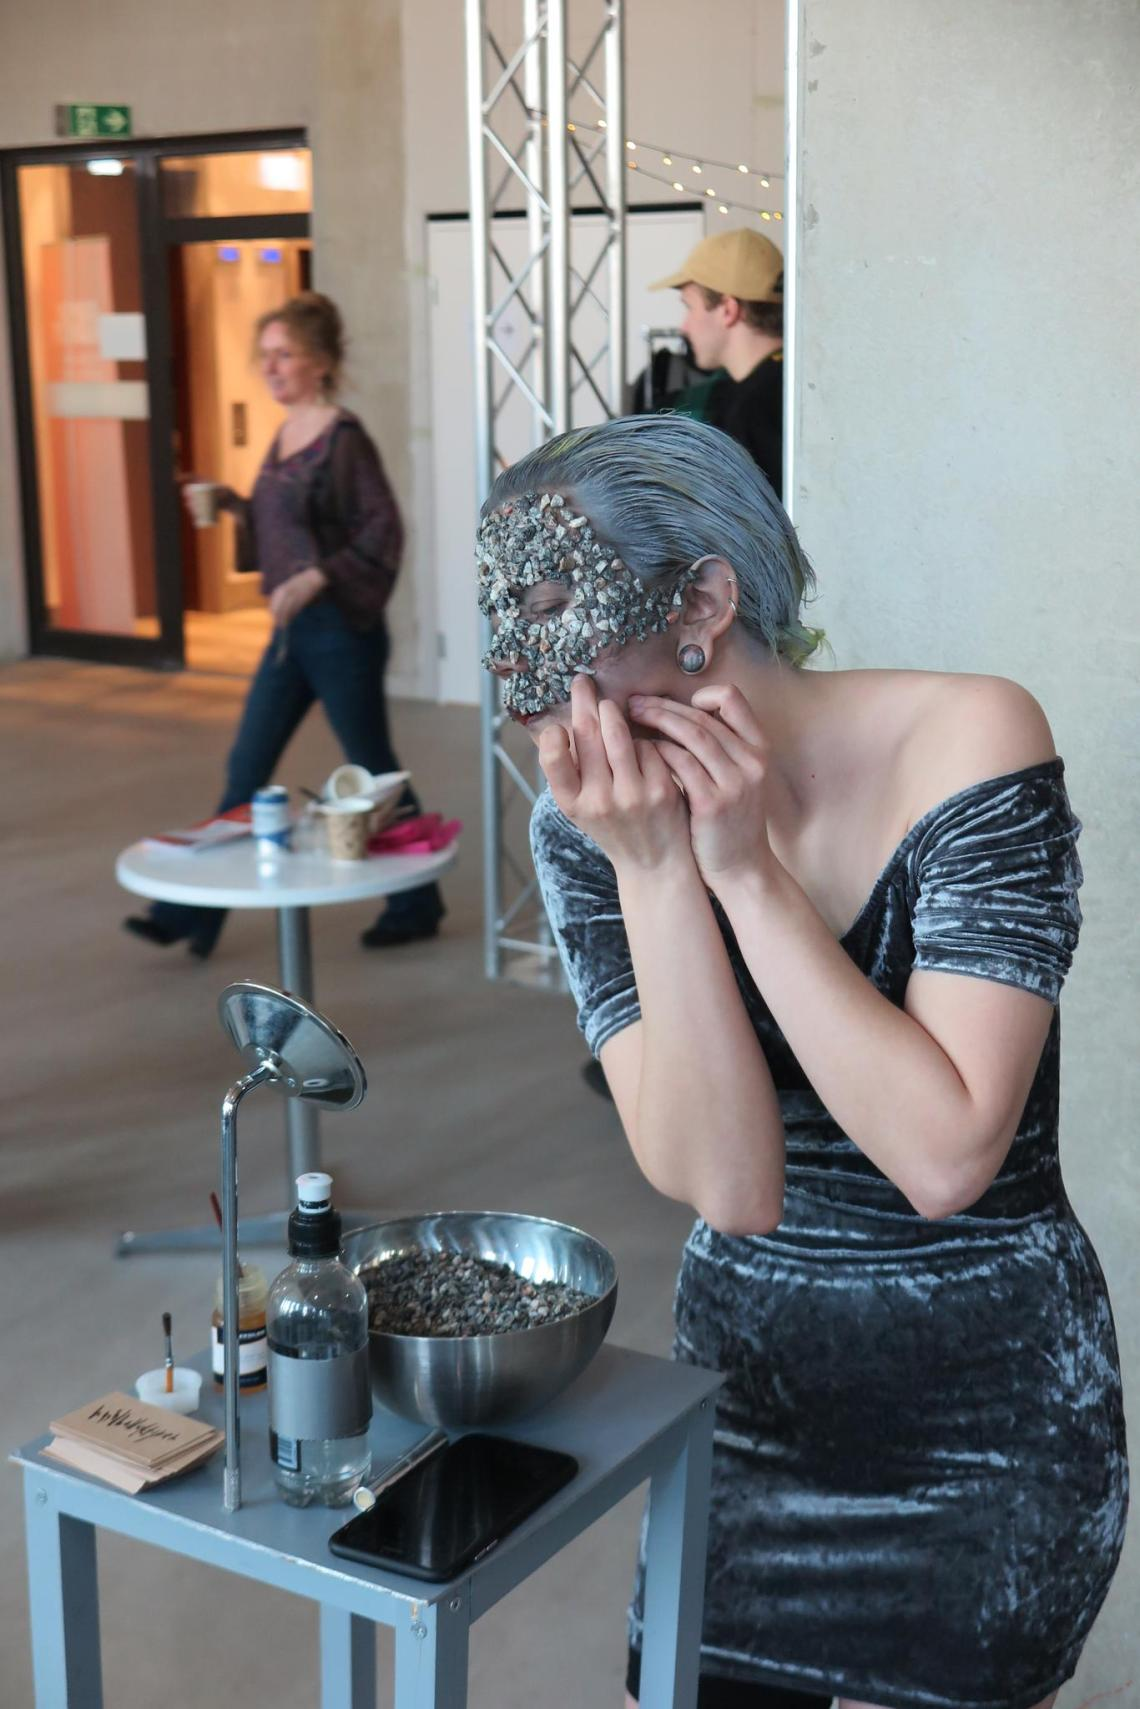 Heidi Edström - The Penal labour